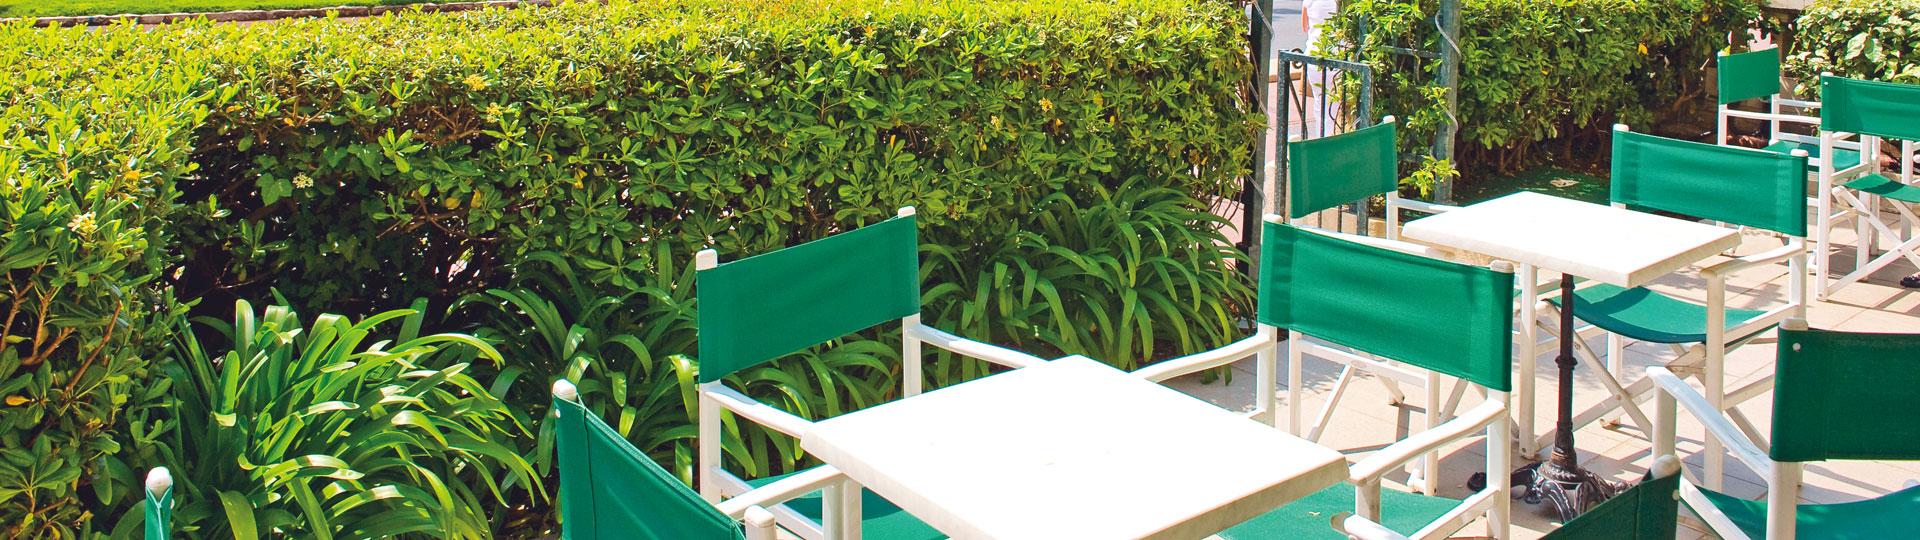 Hotel Nice Vue Sur La Mer  Etoiles